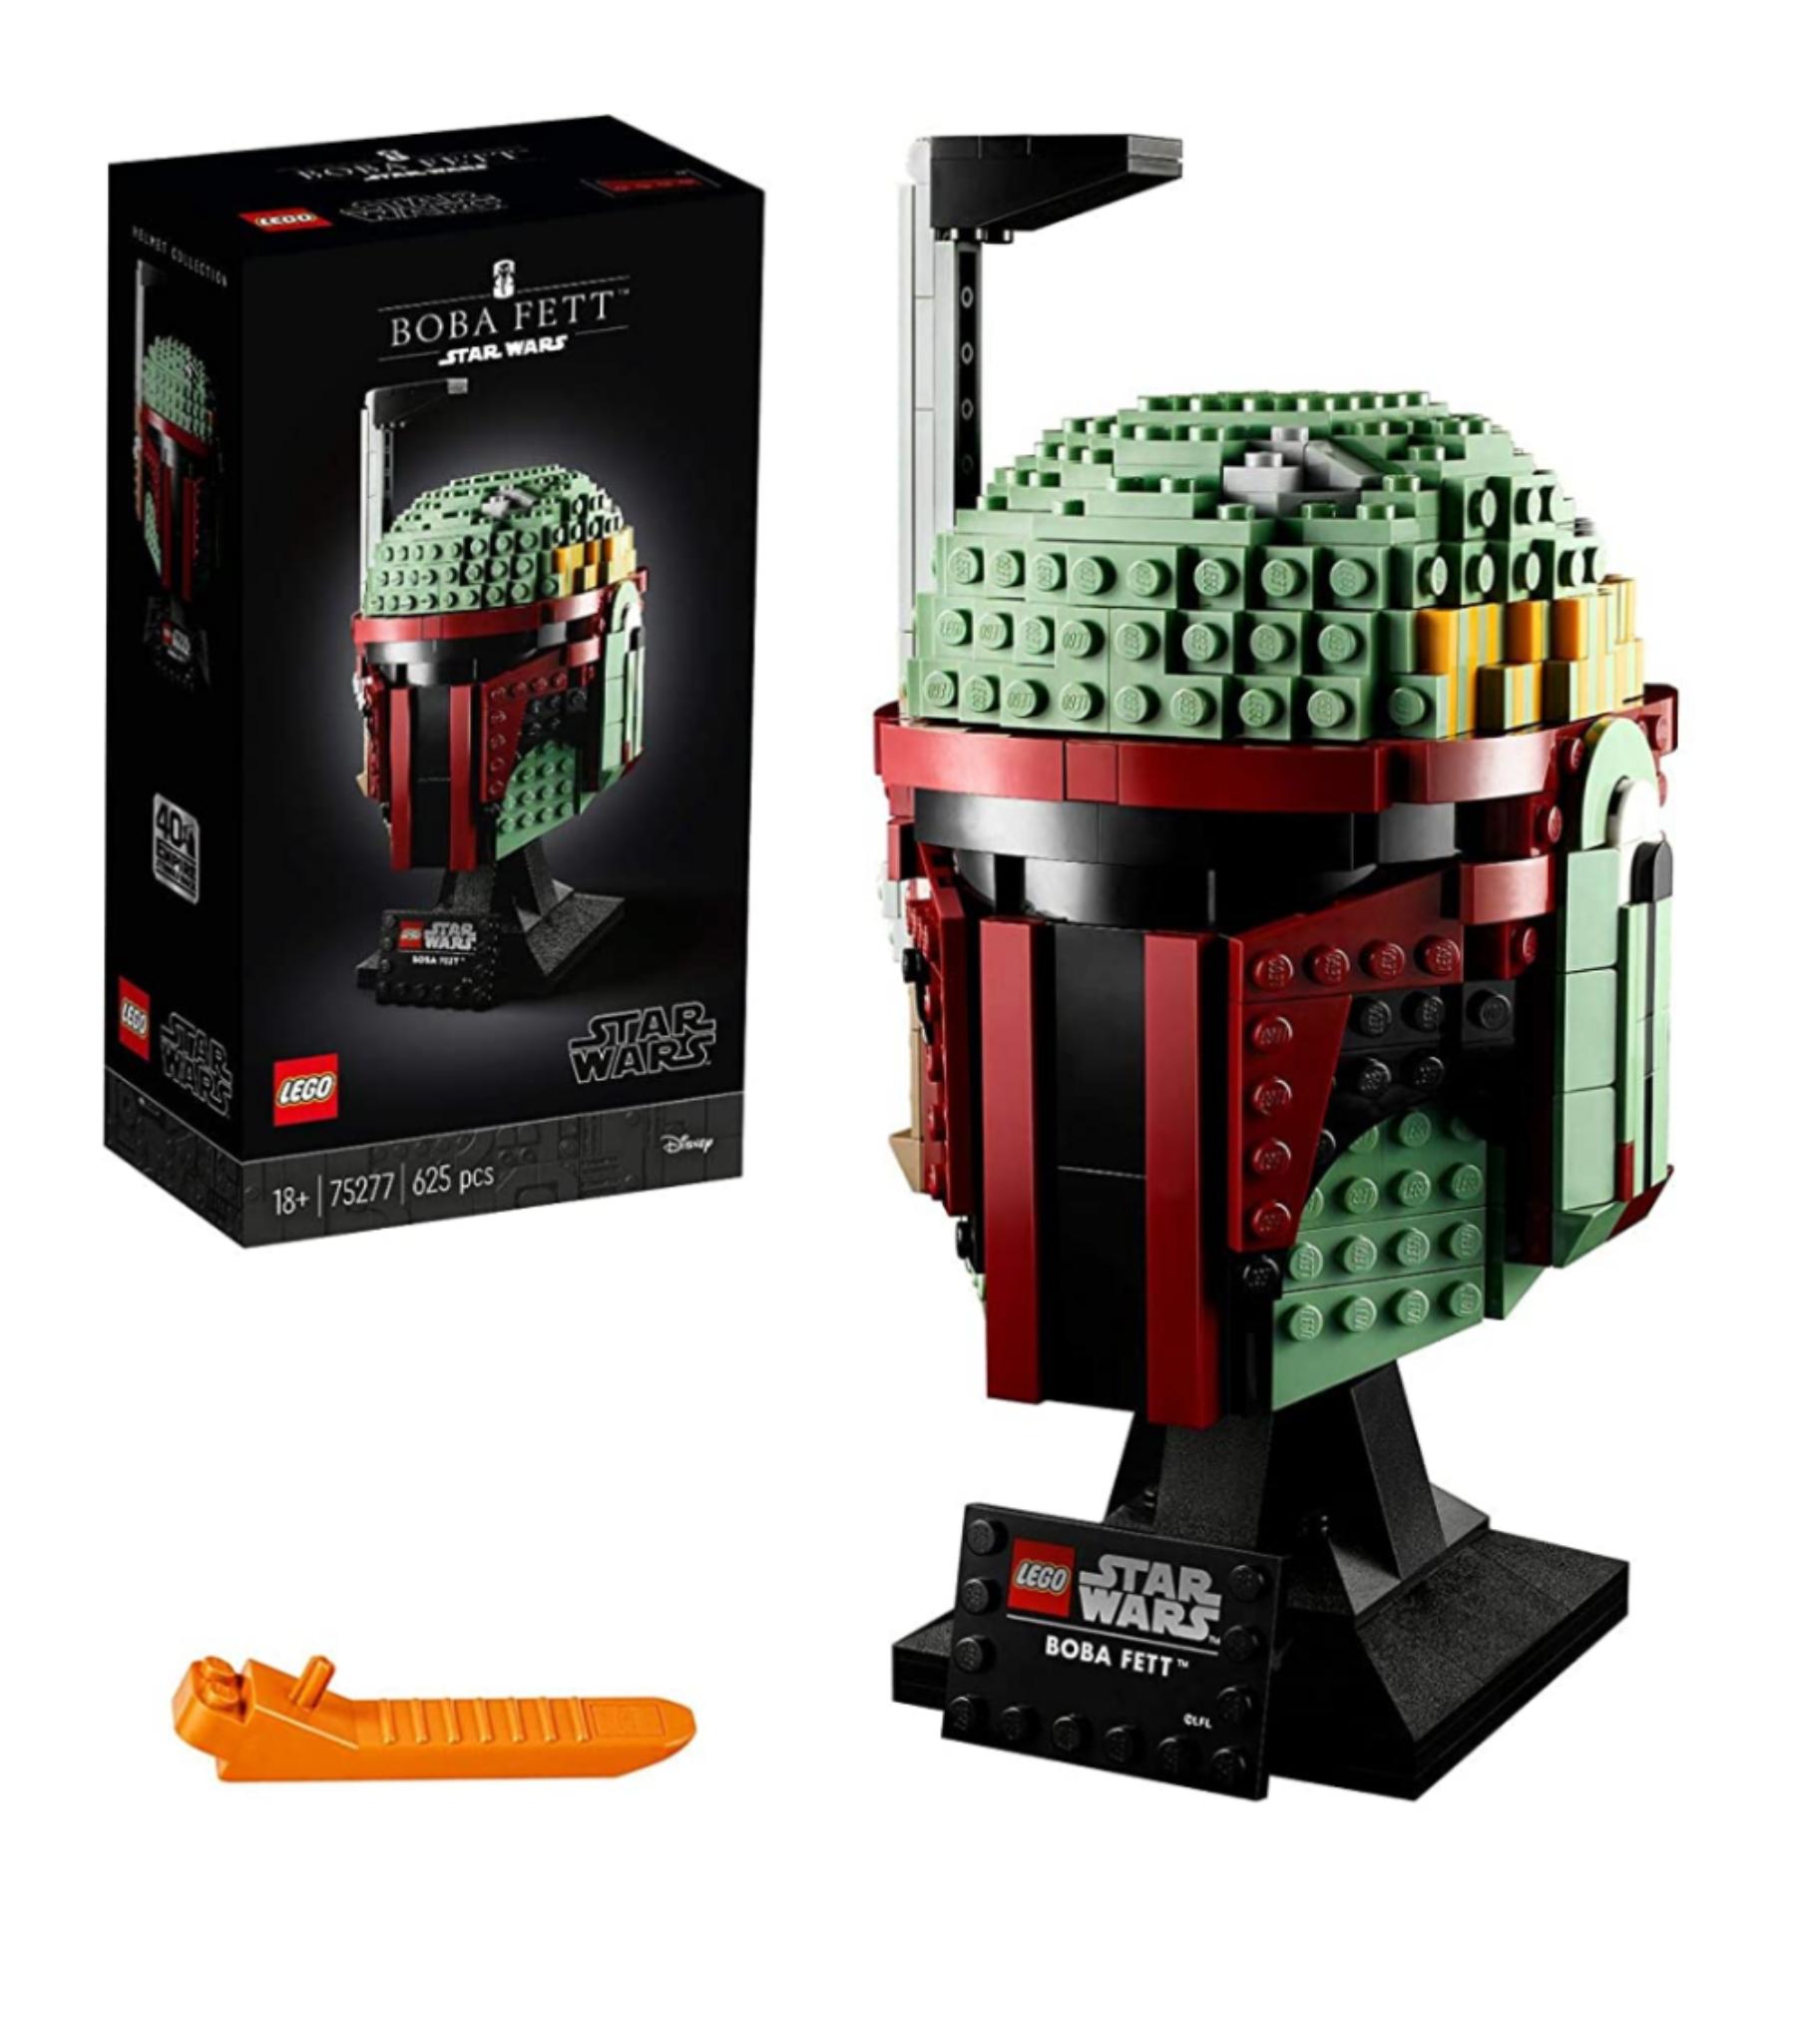 LEGO Boba Fett 75277 Star Wars Amazon & Thalia